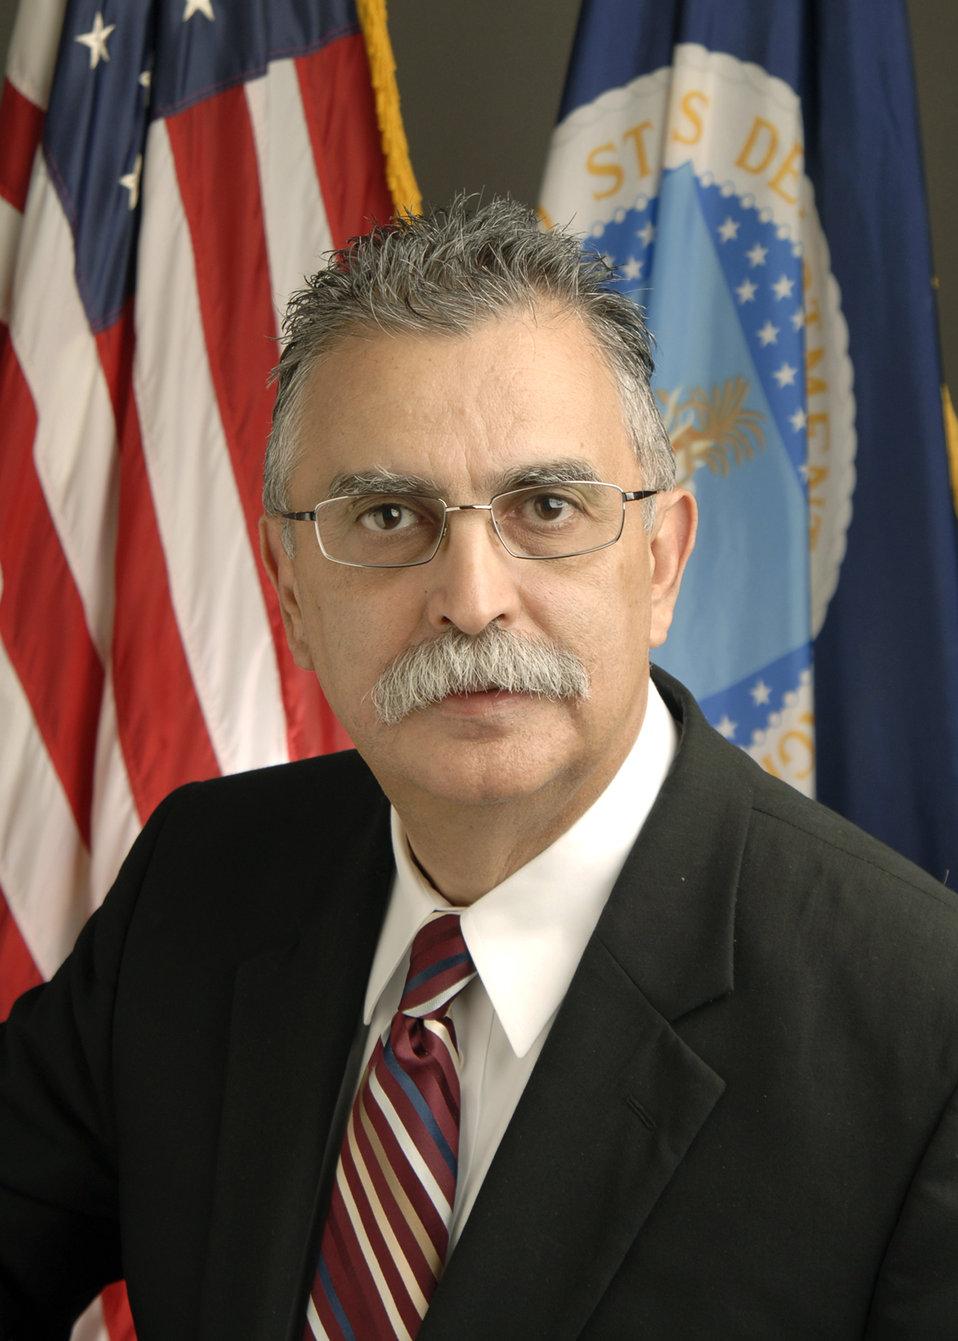 20110609-FSA-KJH-0985 Administrator Farm Service Agency Juan Garcia